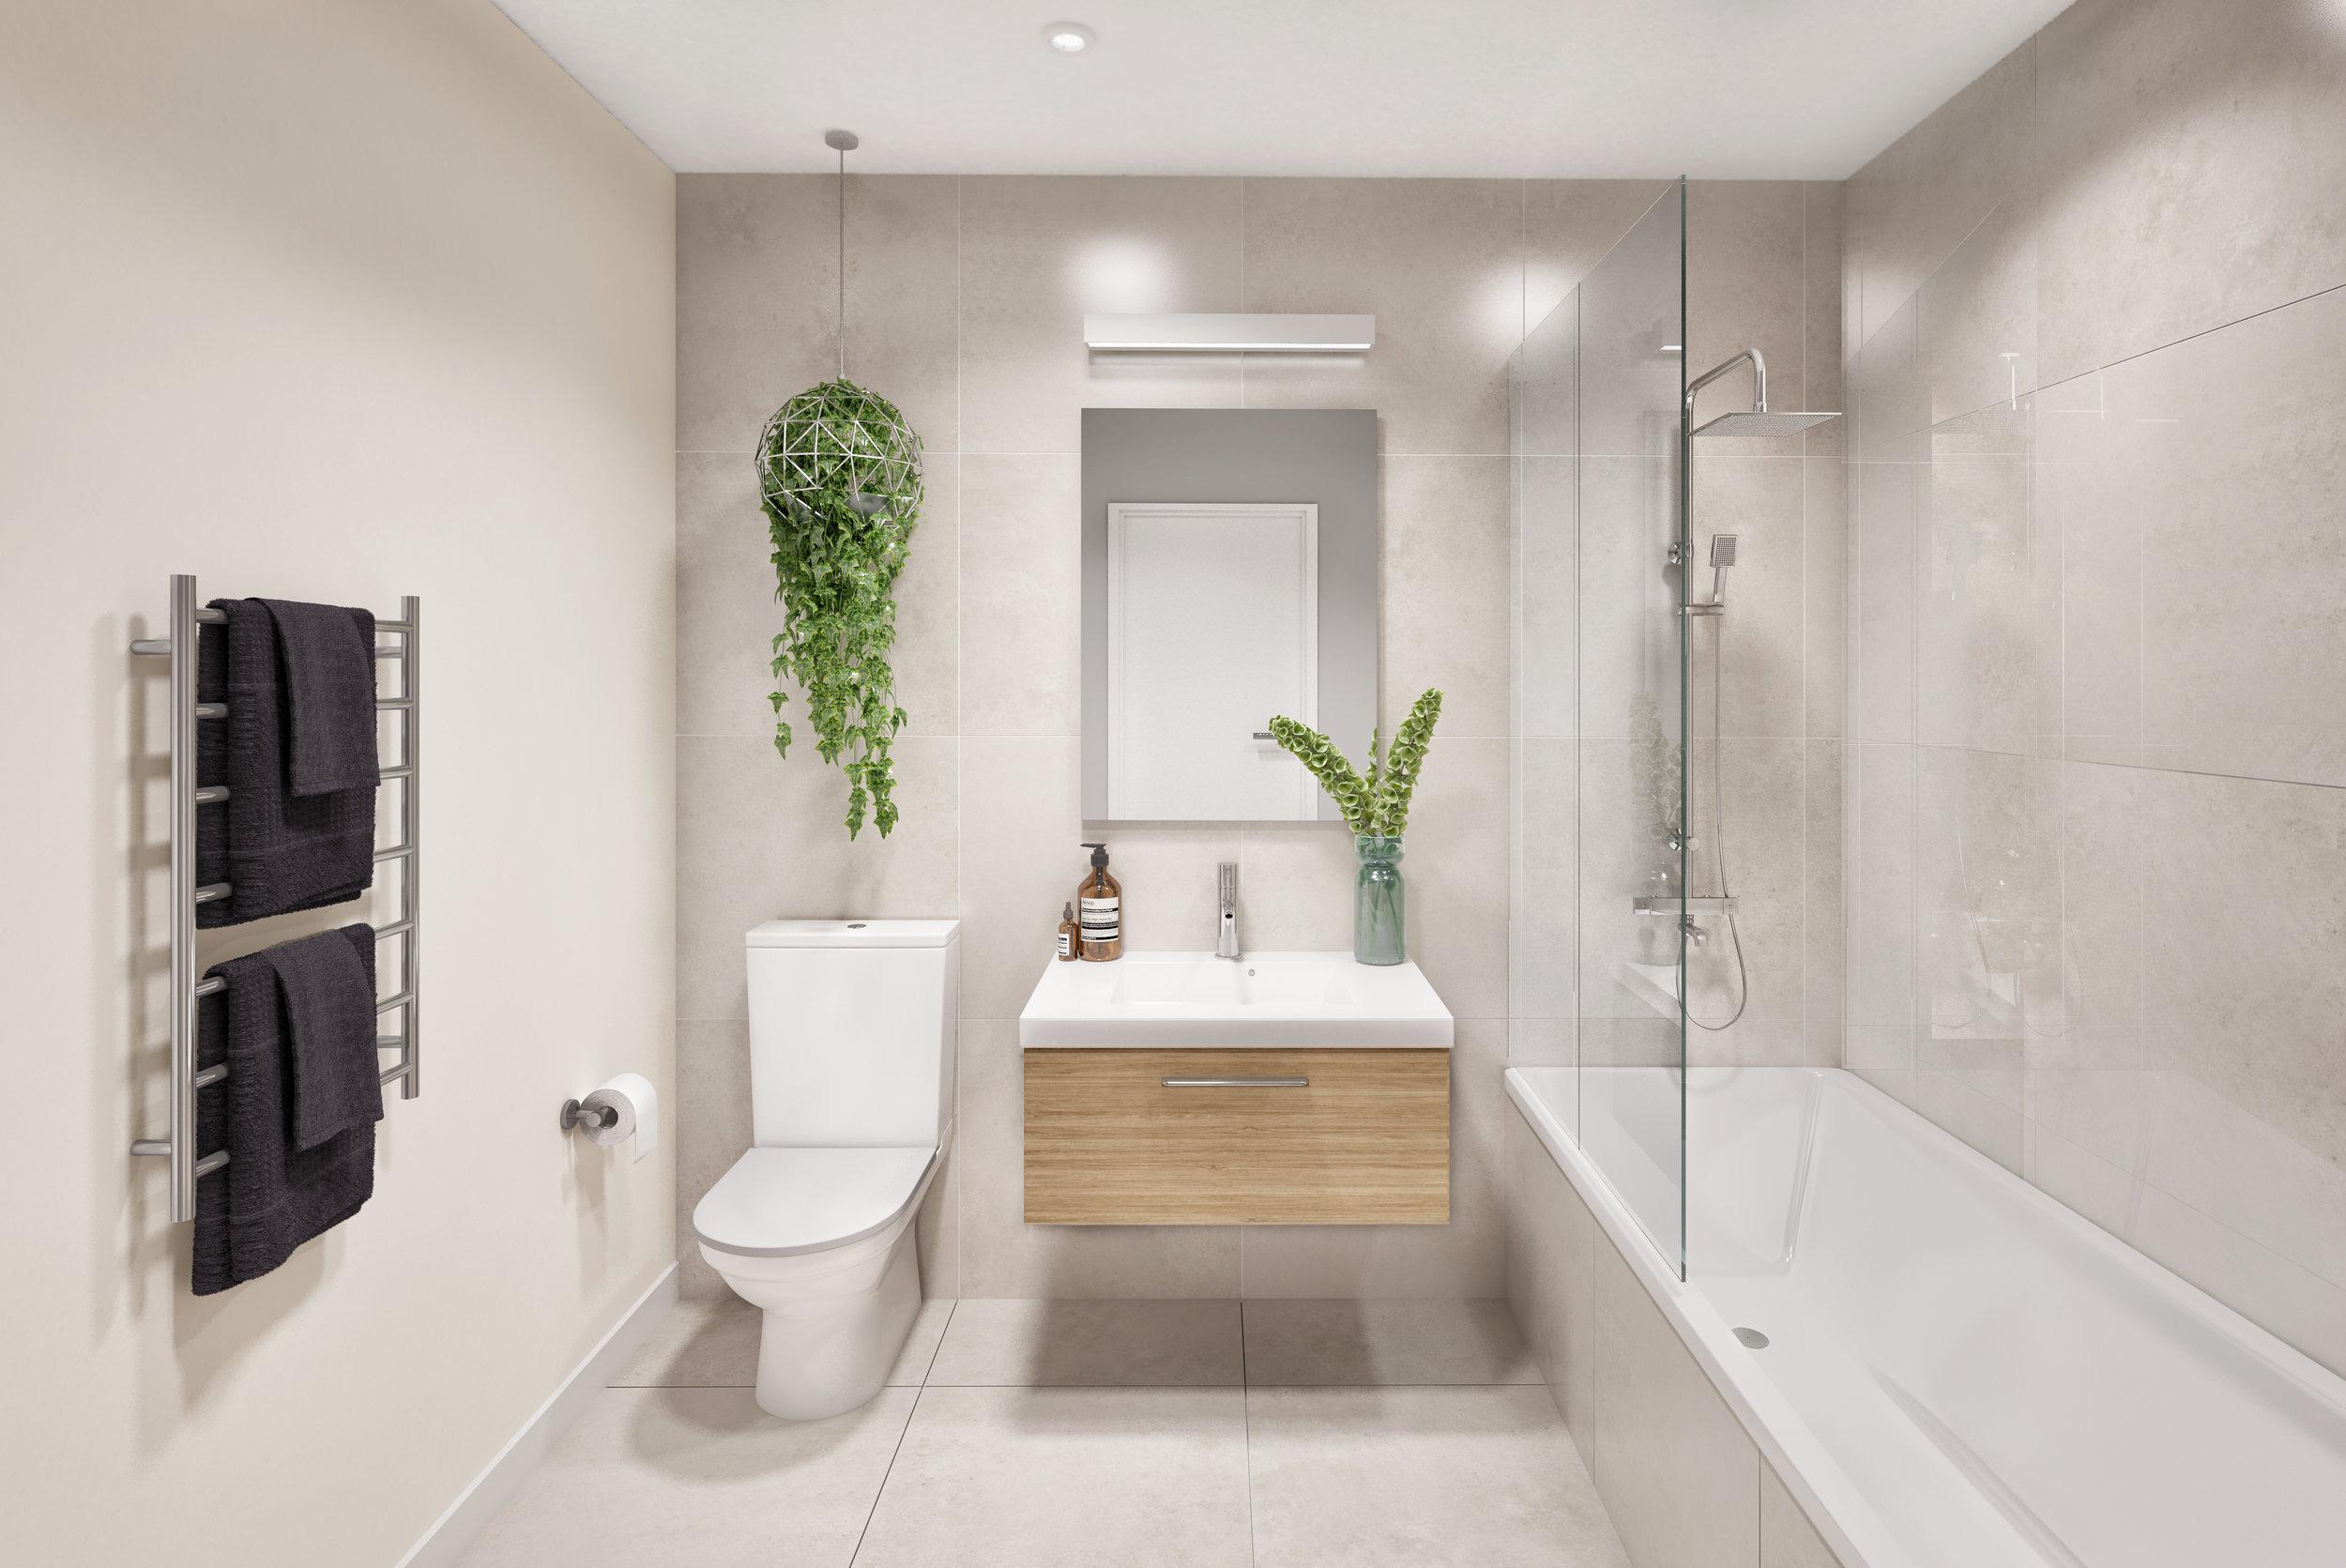 Remarkables_Bathroom_Final05.jpg